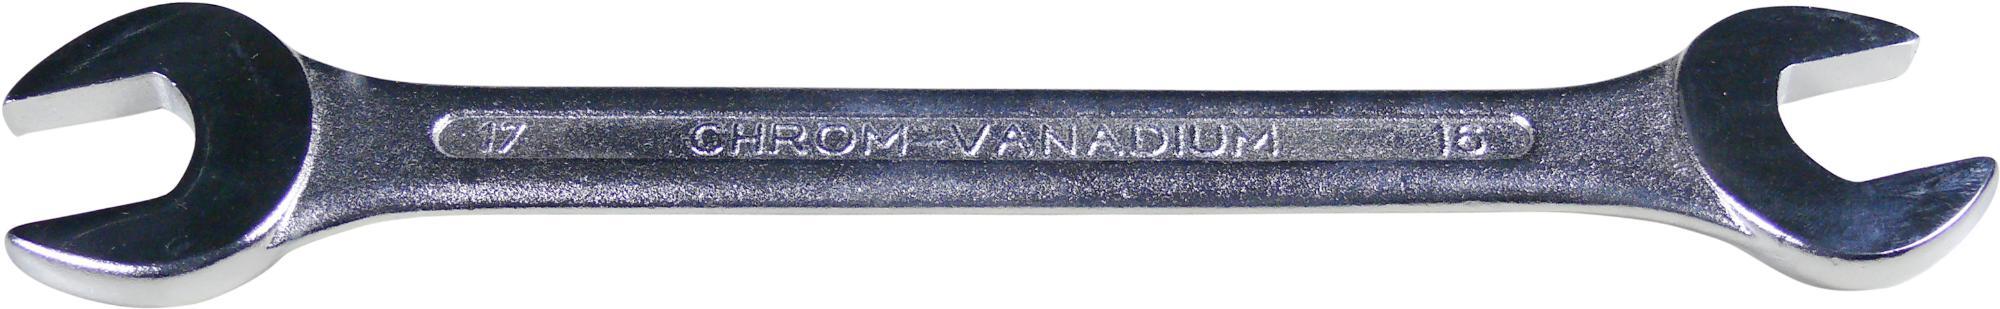 Kľúč vidlica-vidlica, 20x22 mm